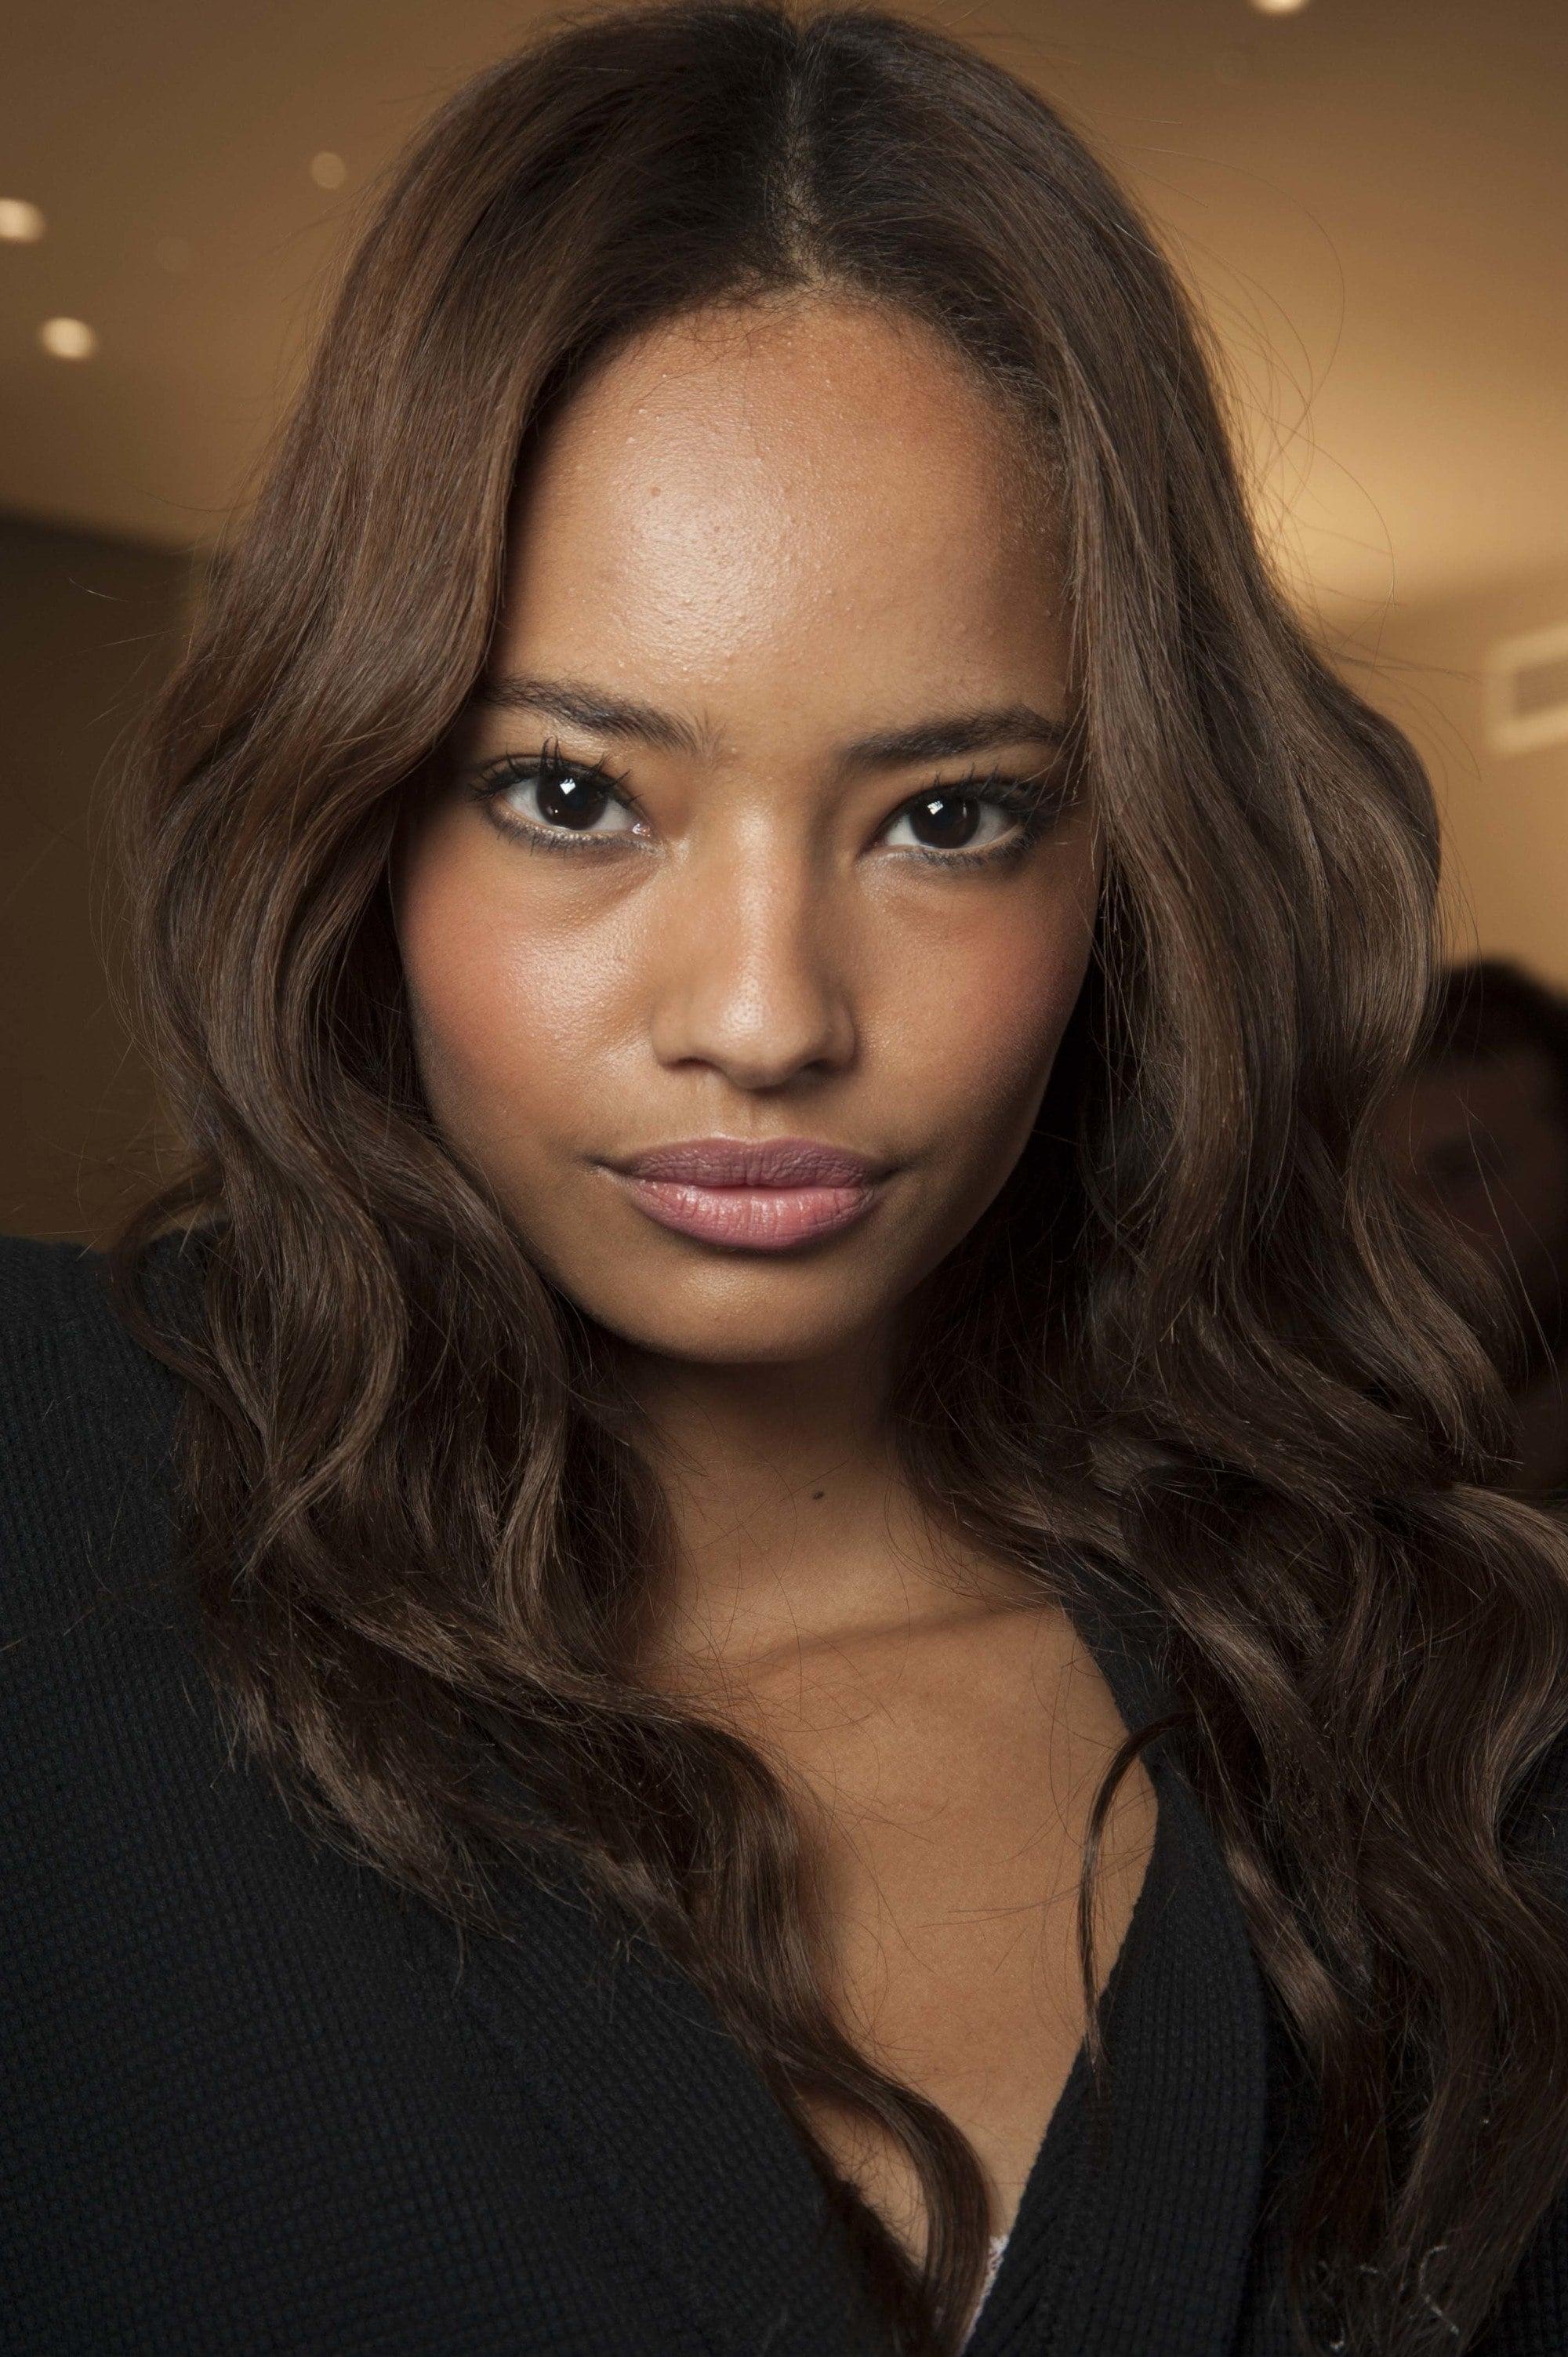 15 Best Hair Colors For Morena Skin In